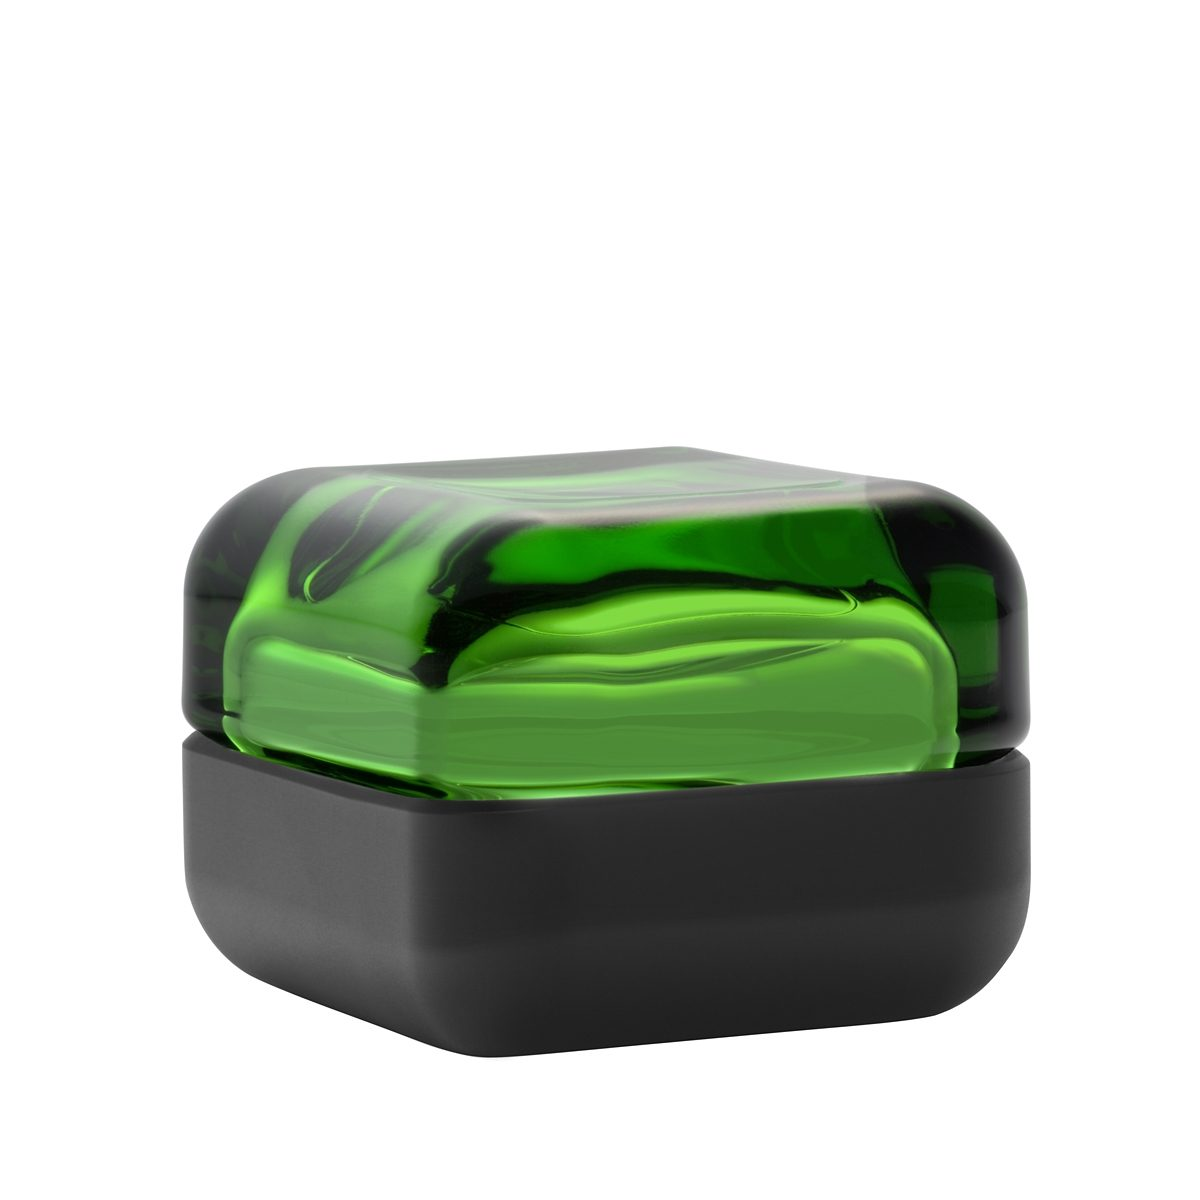 IITTALA Iittala VITRIINI Glasbox 6cm grün-schwarz